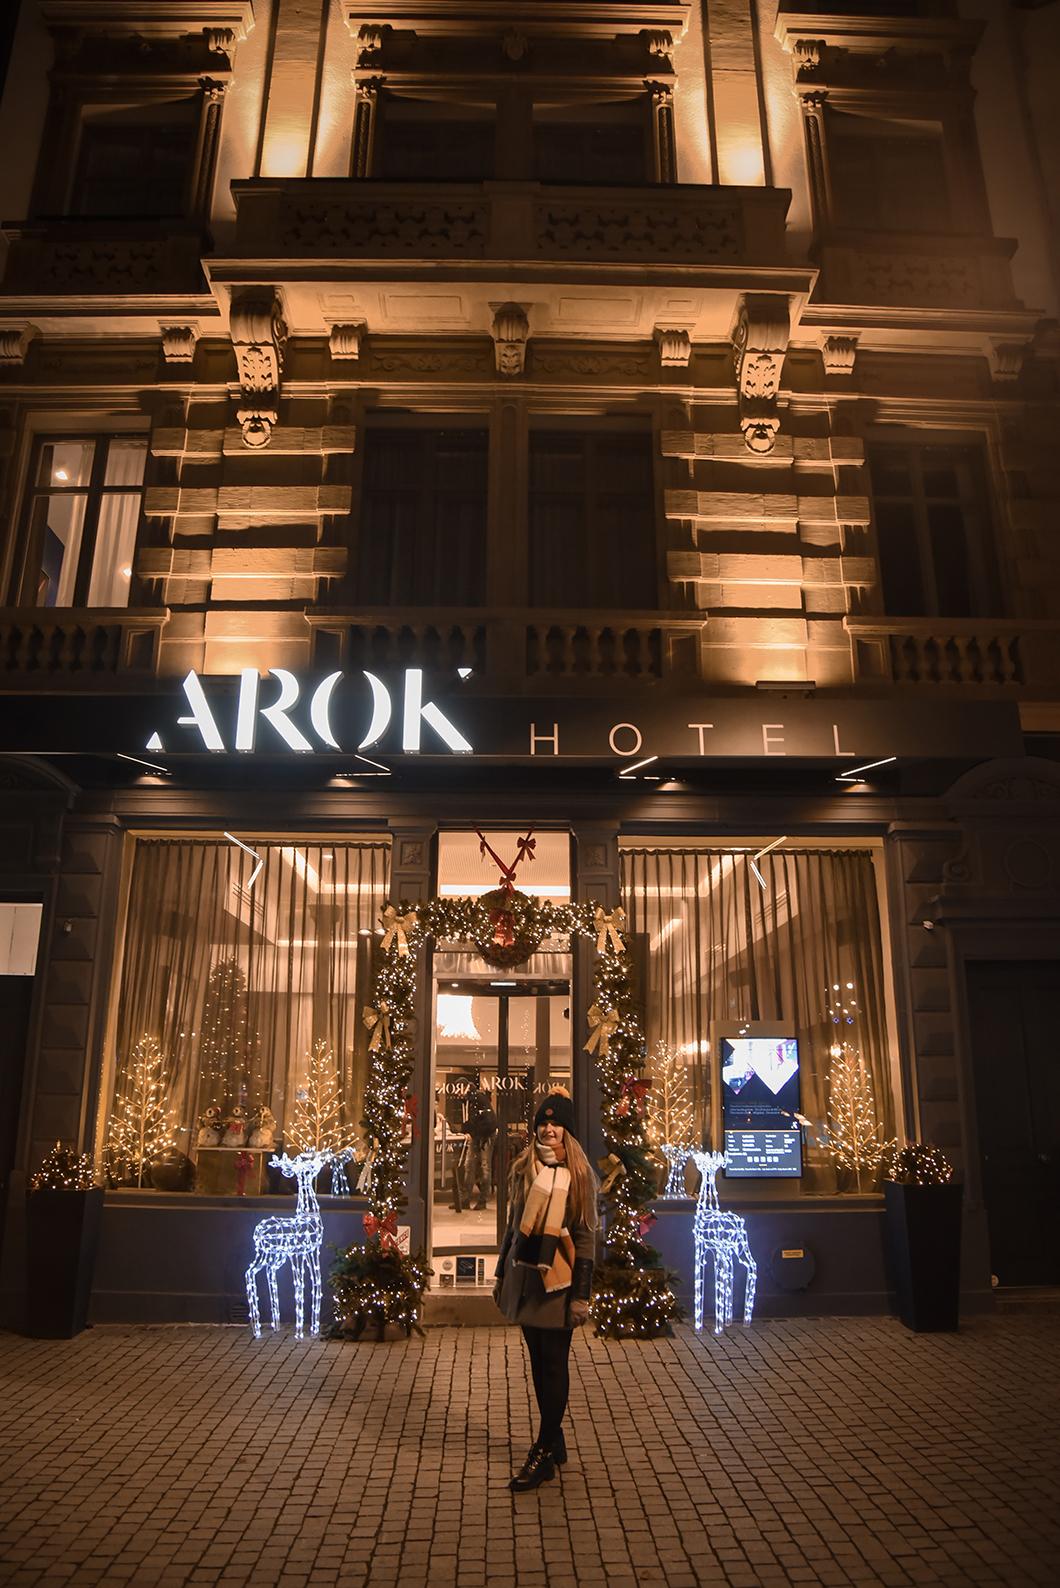 Arok Hôtel, hôtel à Strasbourg